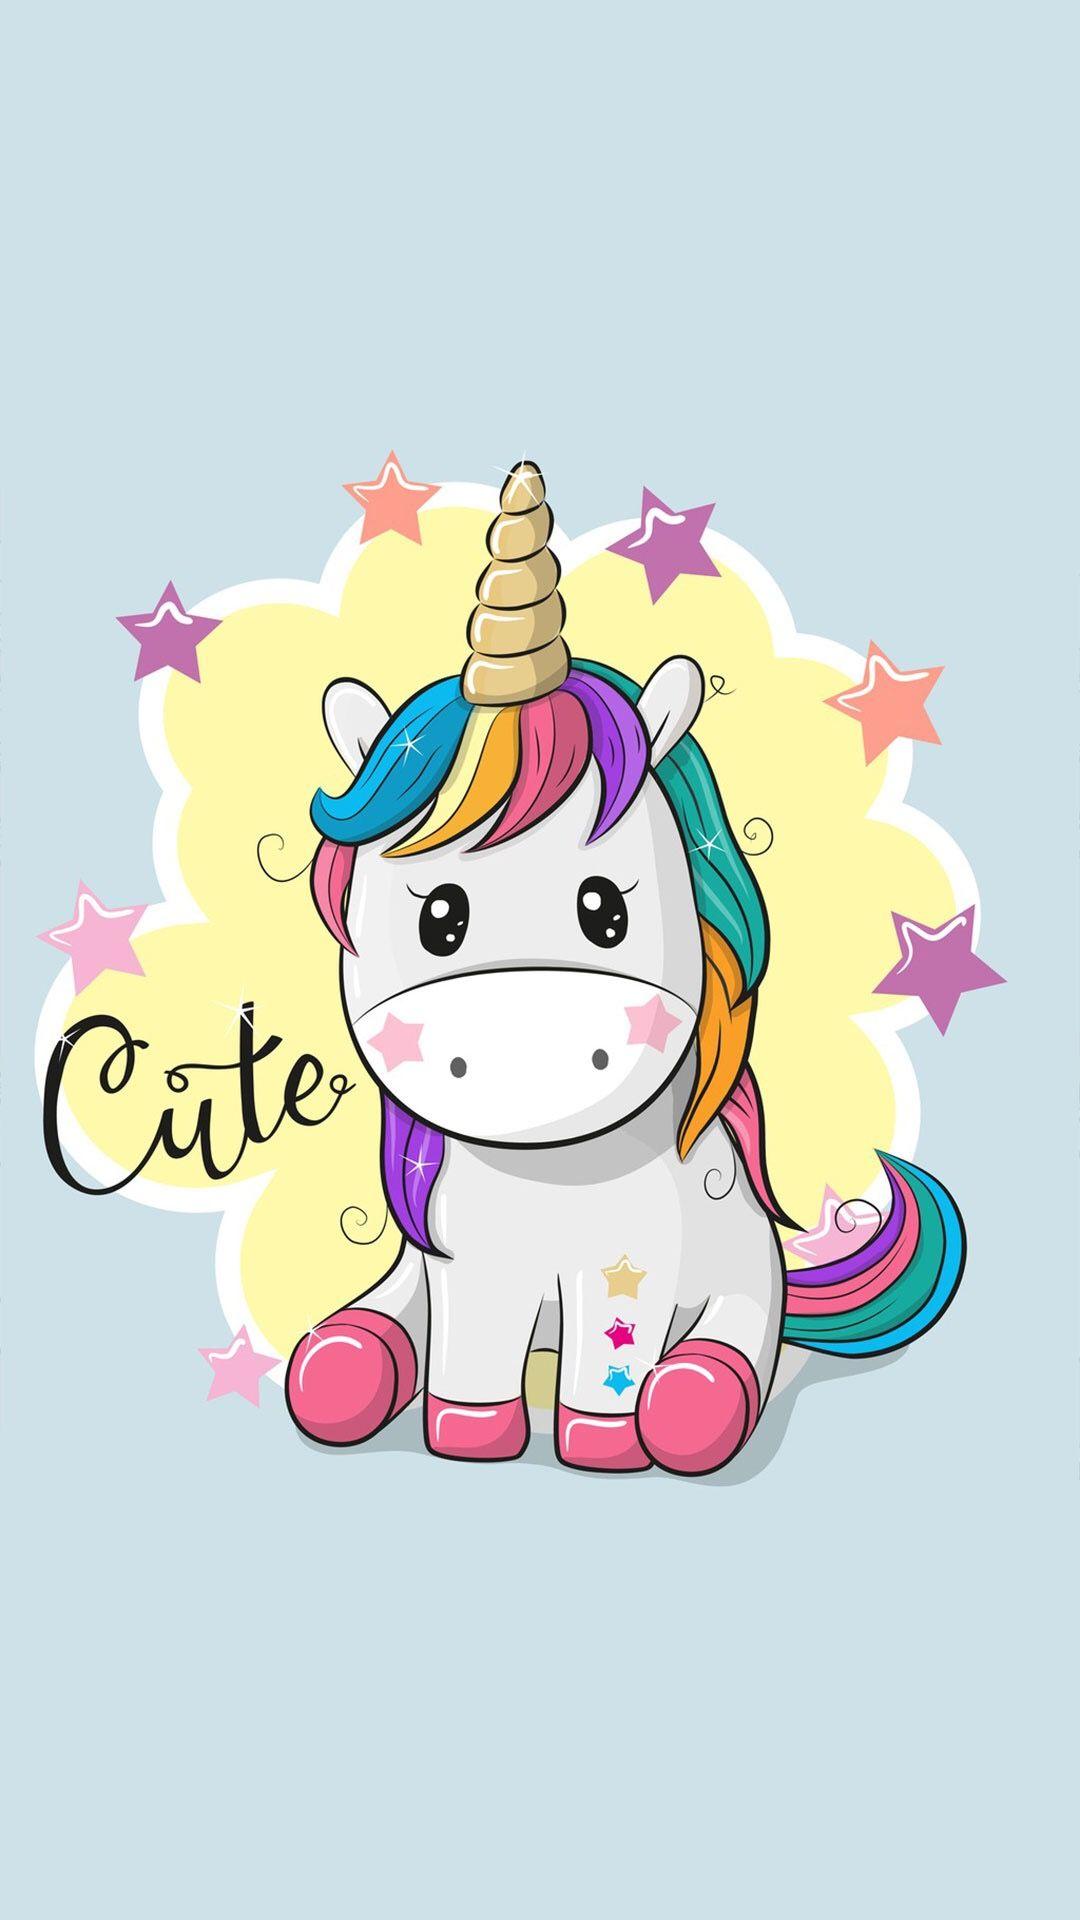 Pin Oleh Yanedisenos Di Unicornio2 Dengan Gambar Kuda Poni